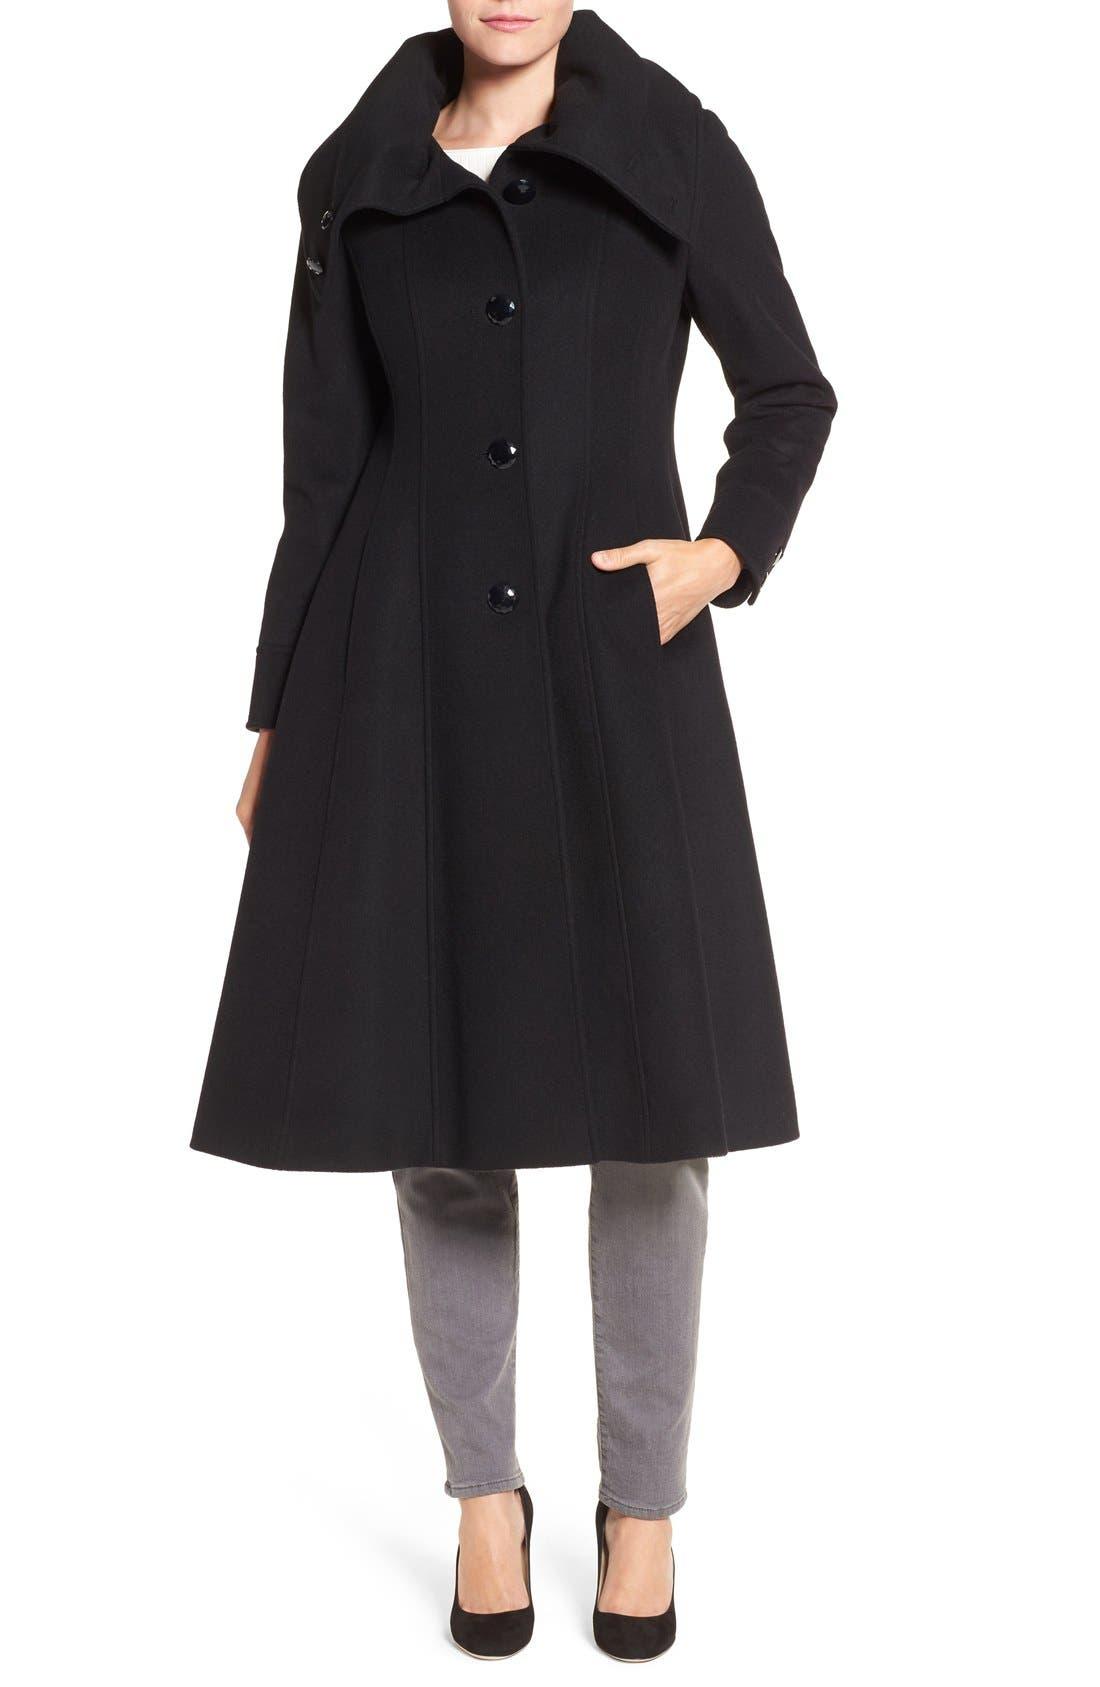 Main Image - George Simonton High Neck Wool Blend Long Coat